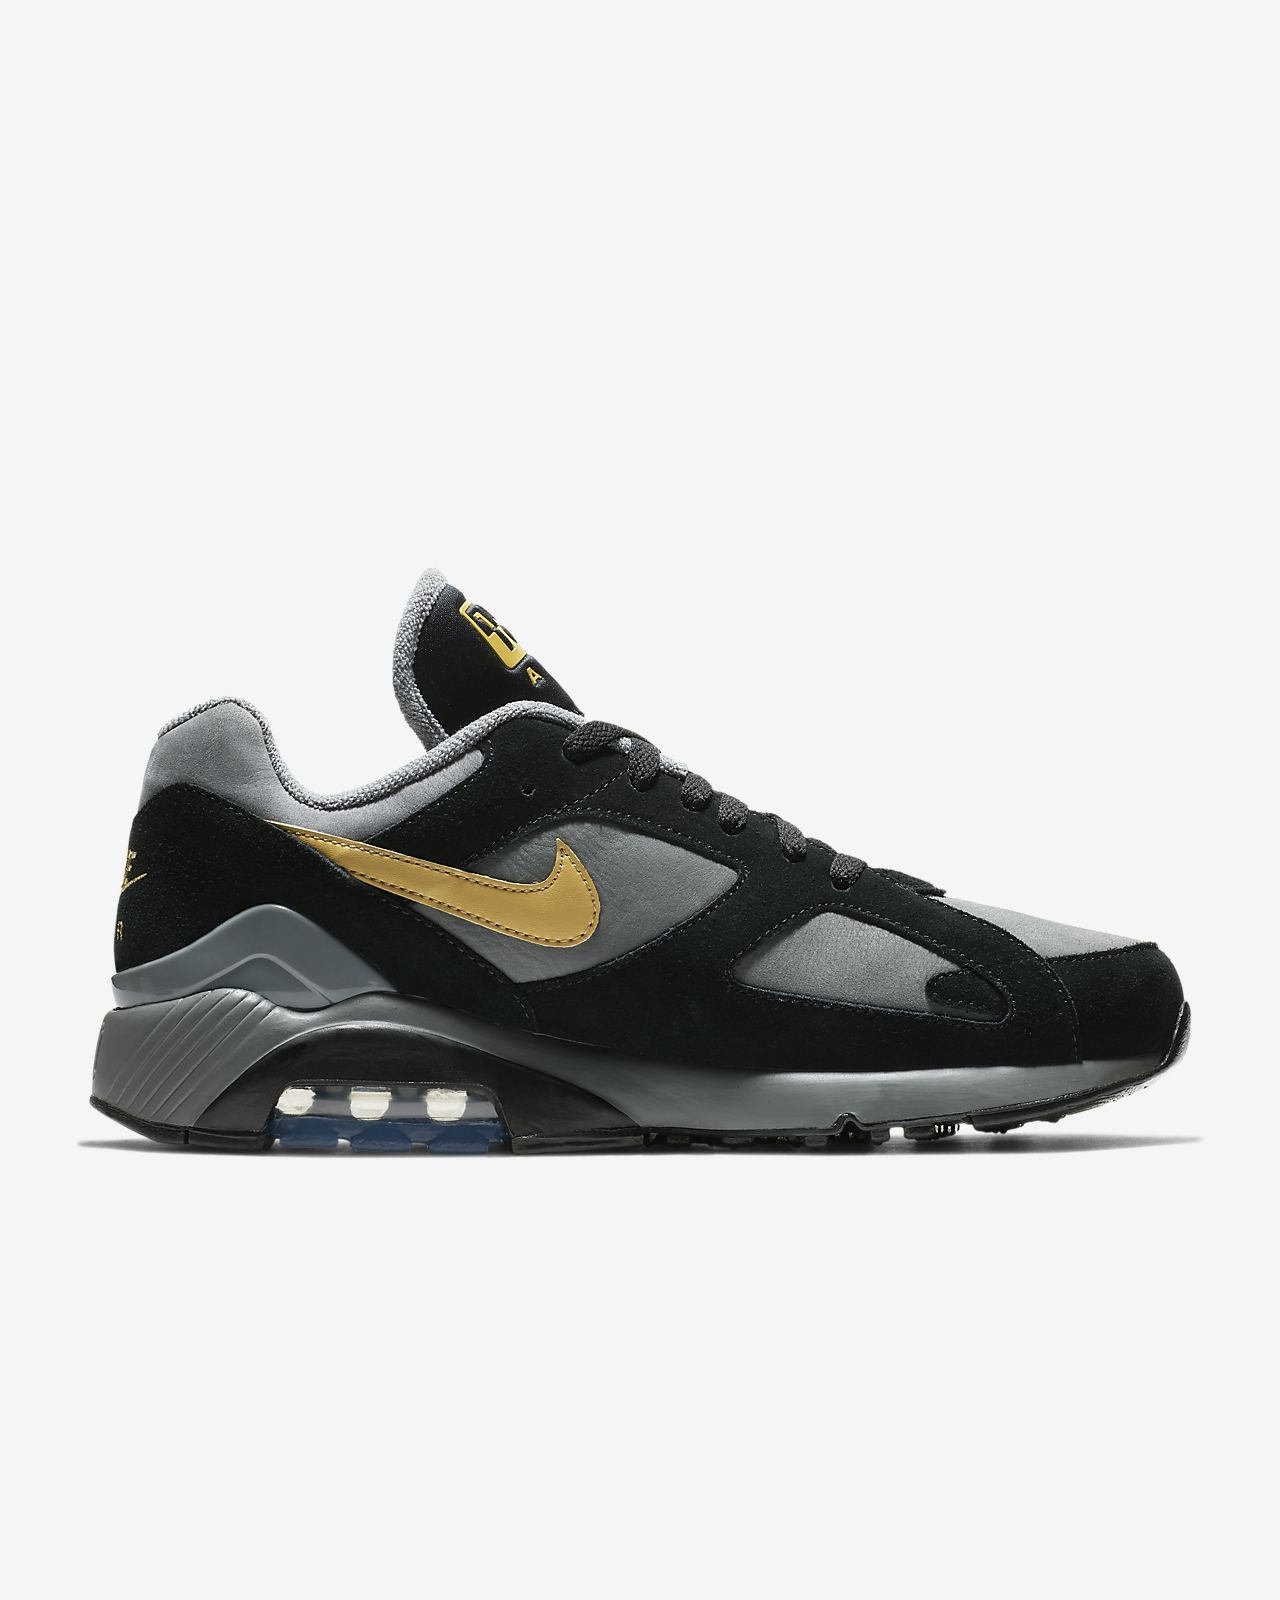 sale retailer 67c3a fc102 ... Sko Nike Air Max 180 för män